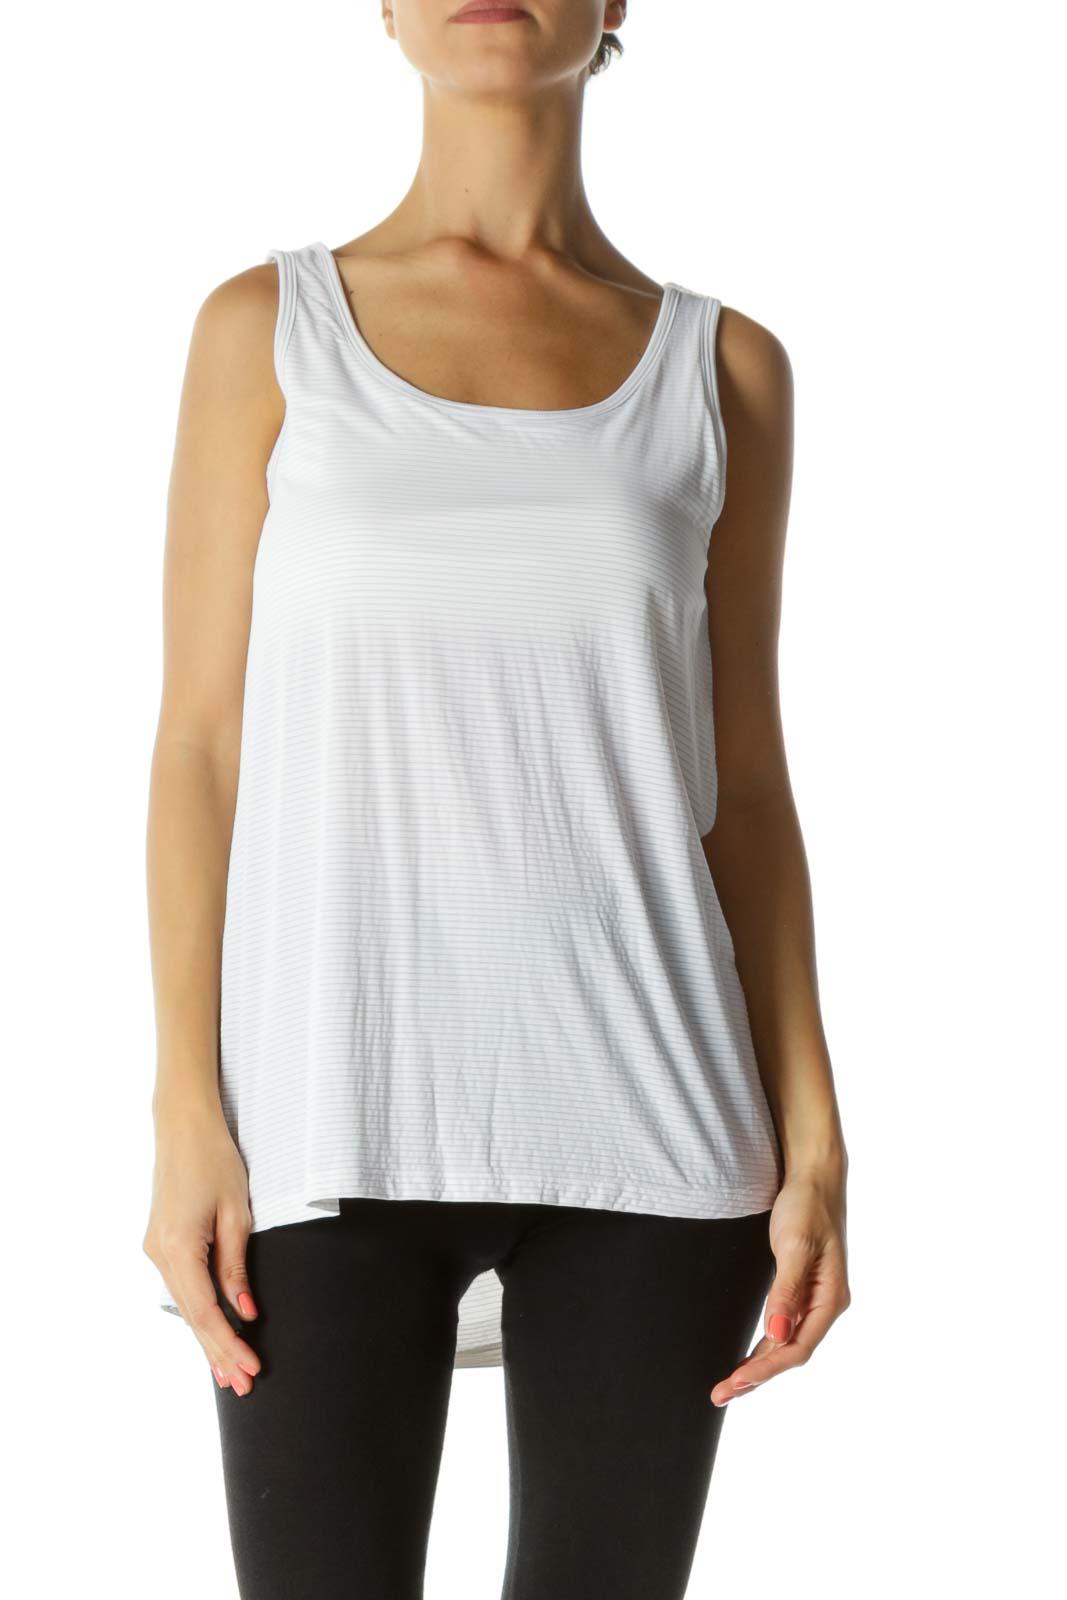 White Stripe Sporty Yoga Top Front